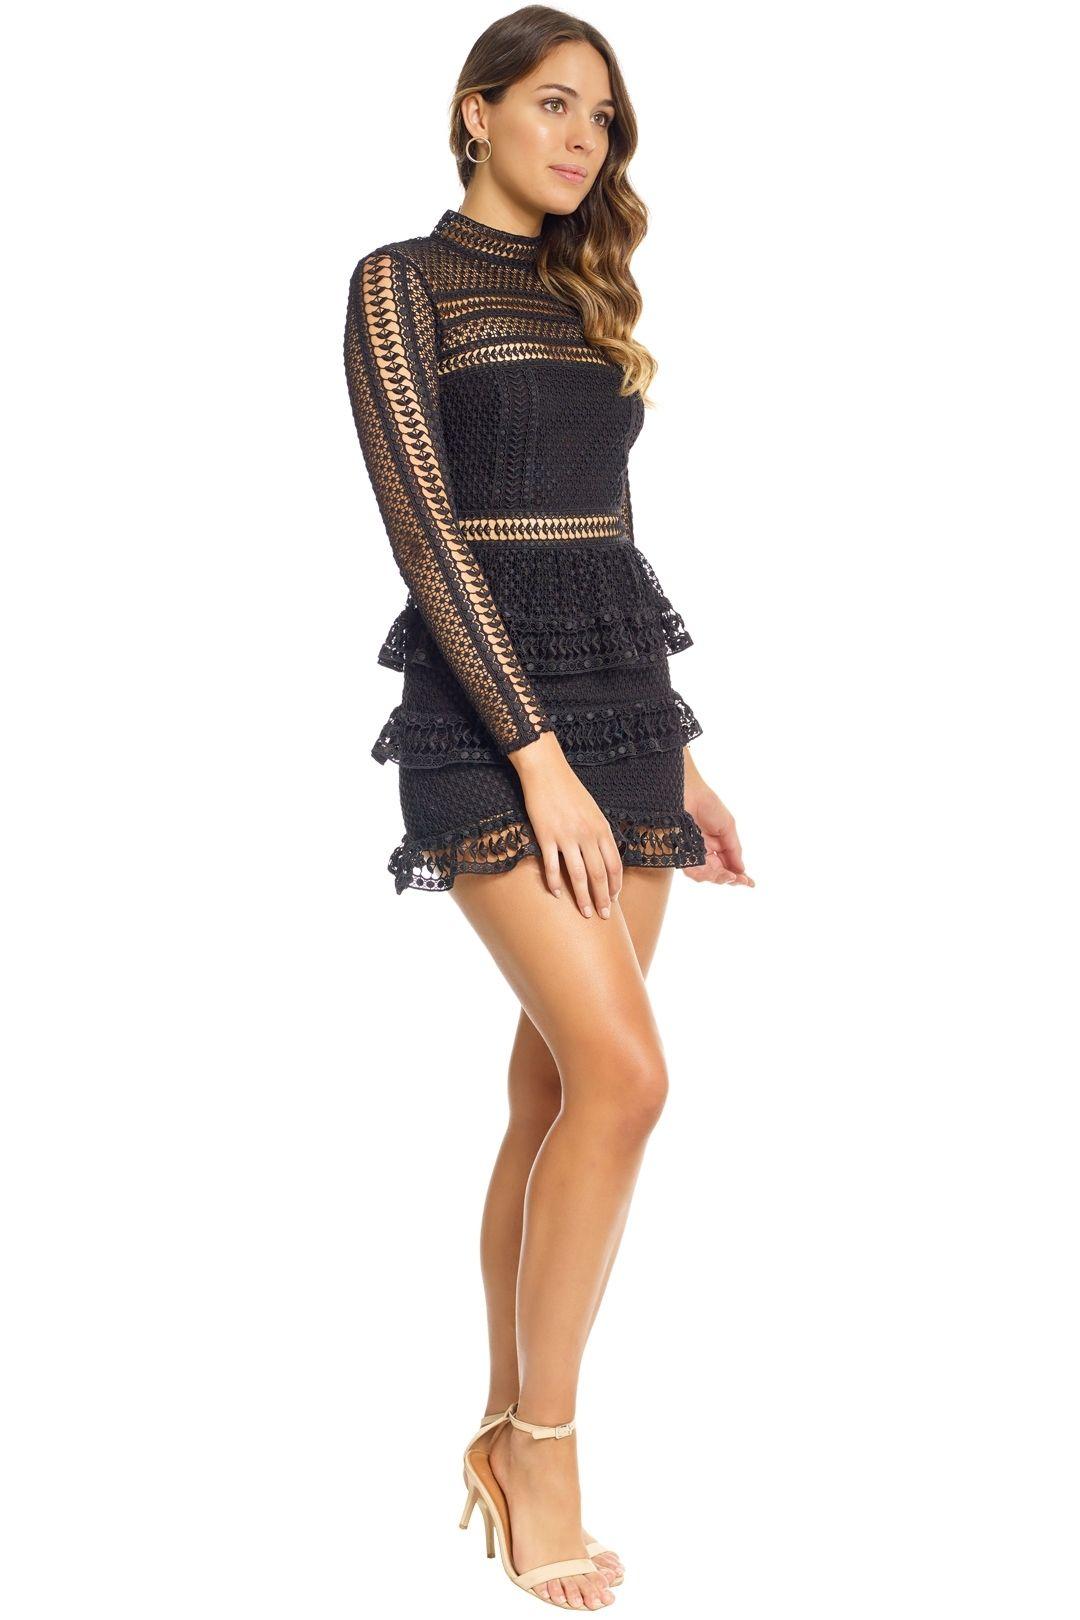 Self Portrait - Tiered Guipure Lace Mini Dress - Black - Side